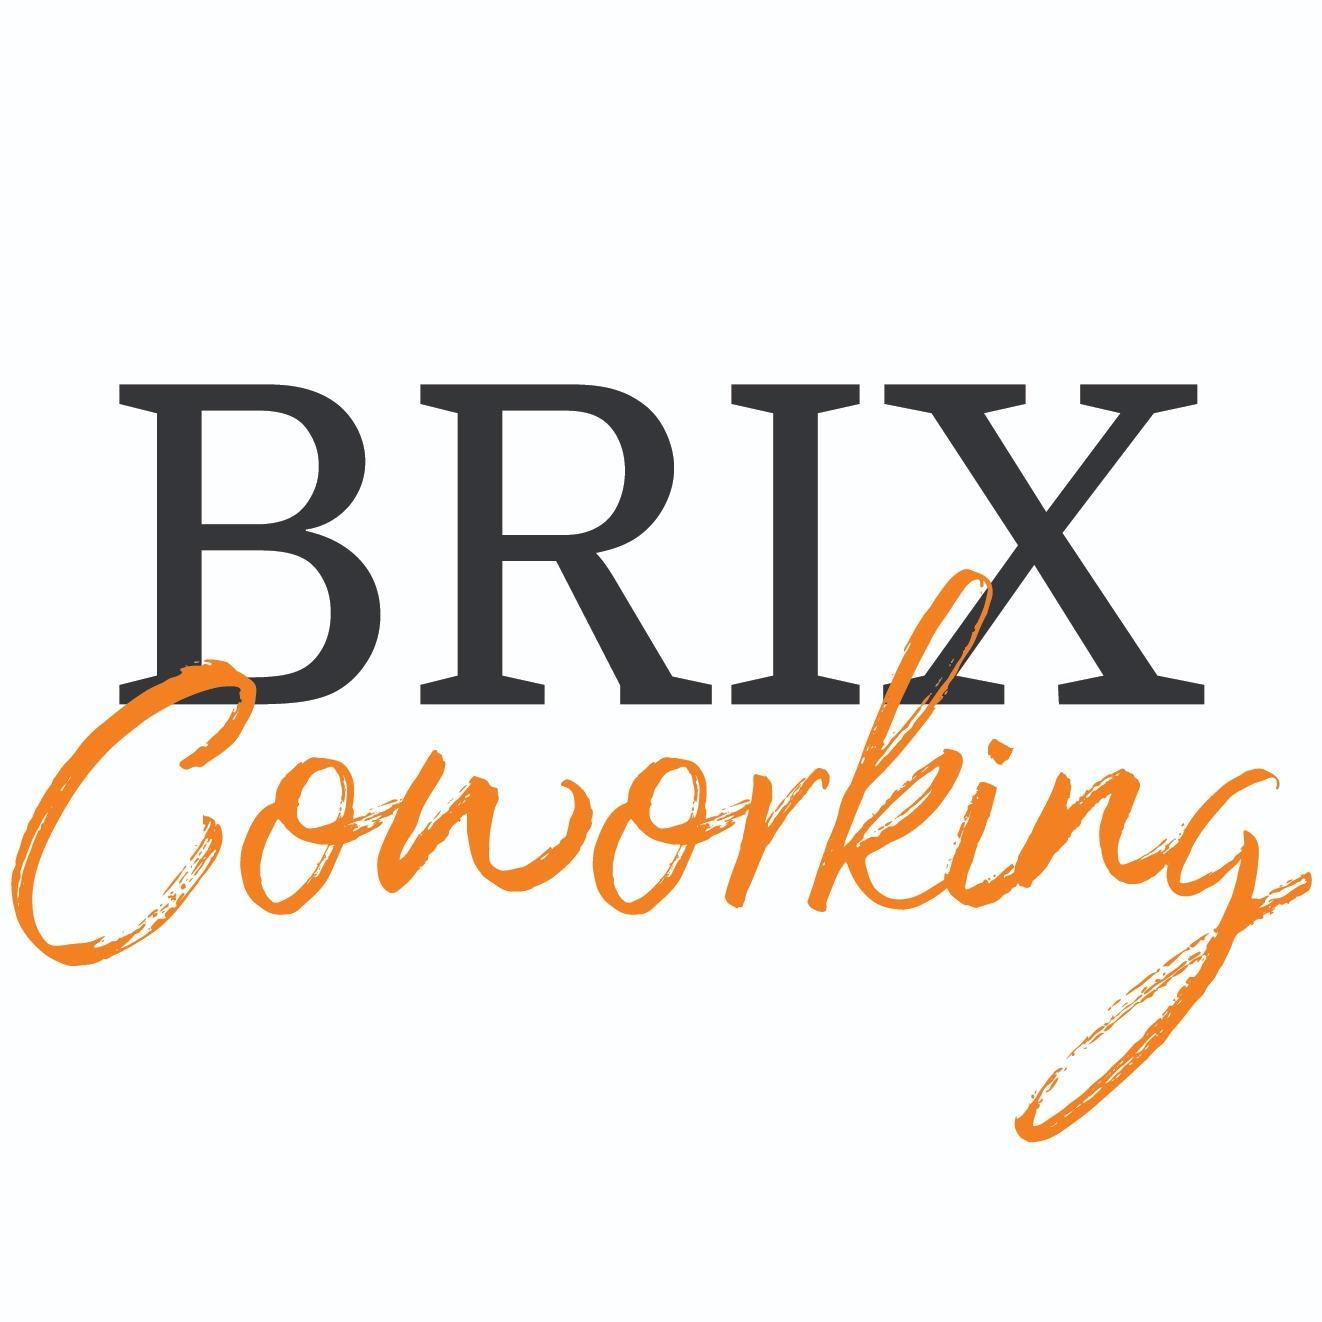 Brix Coworking